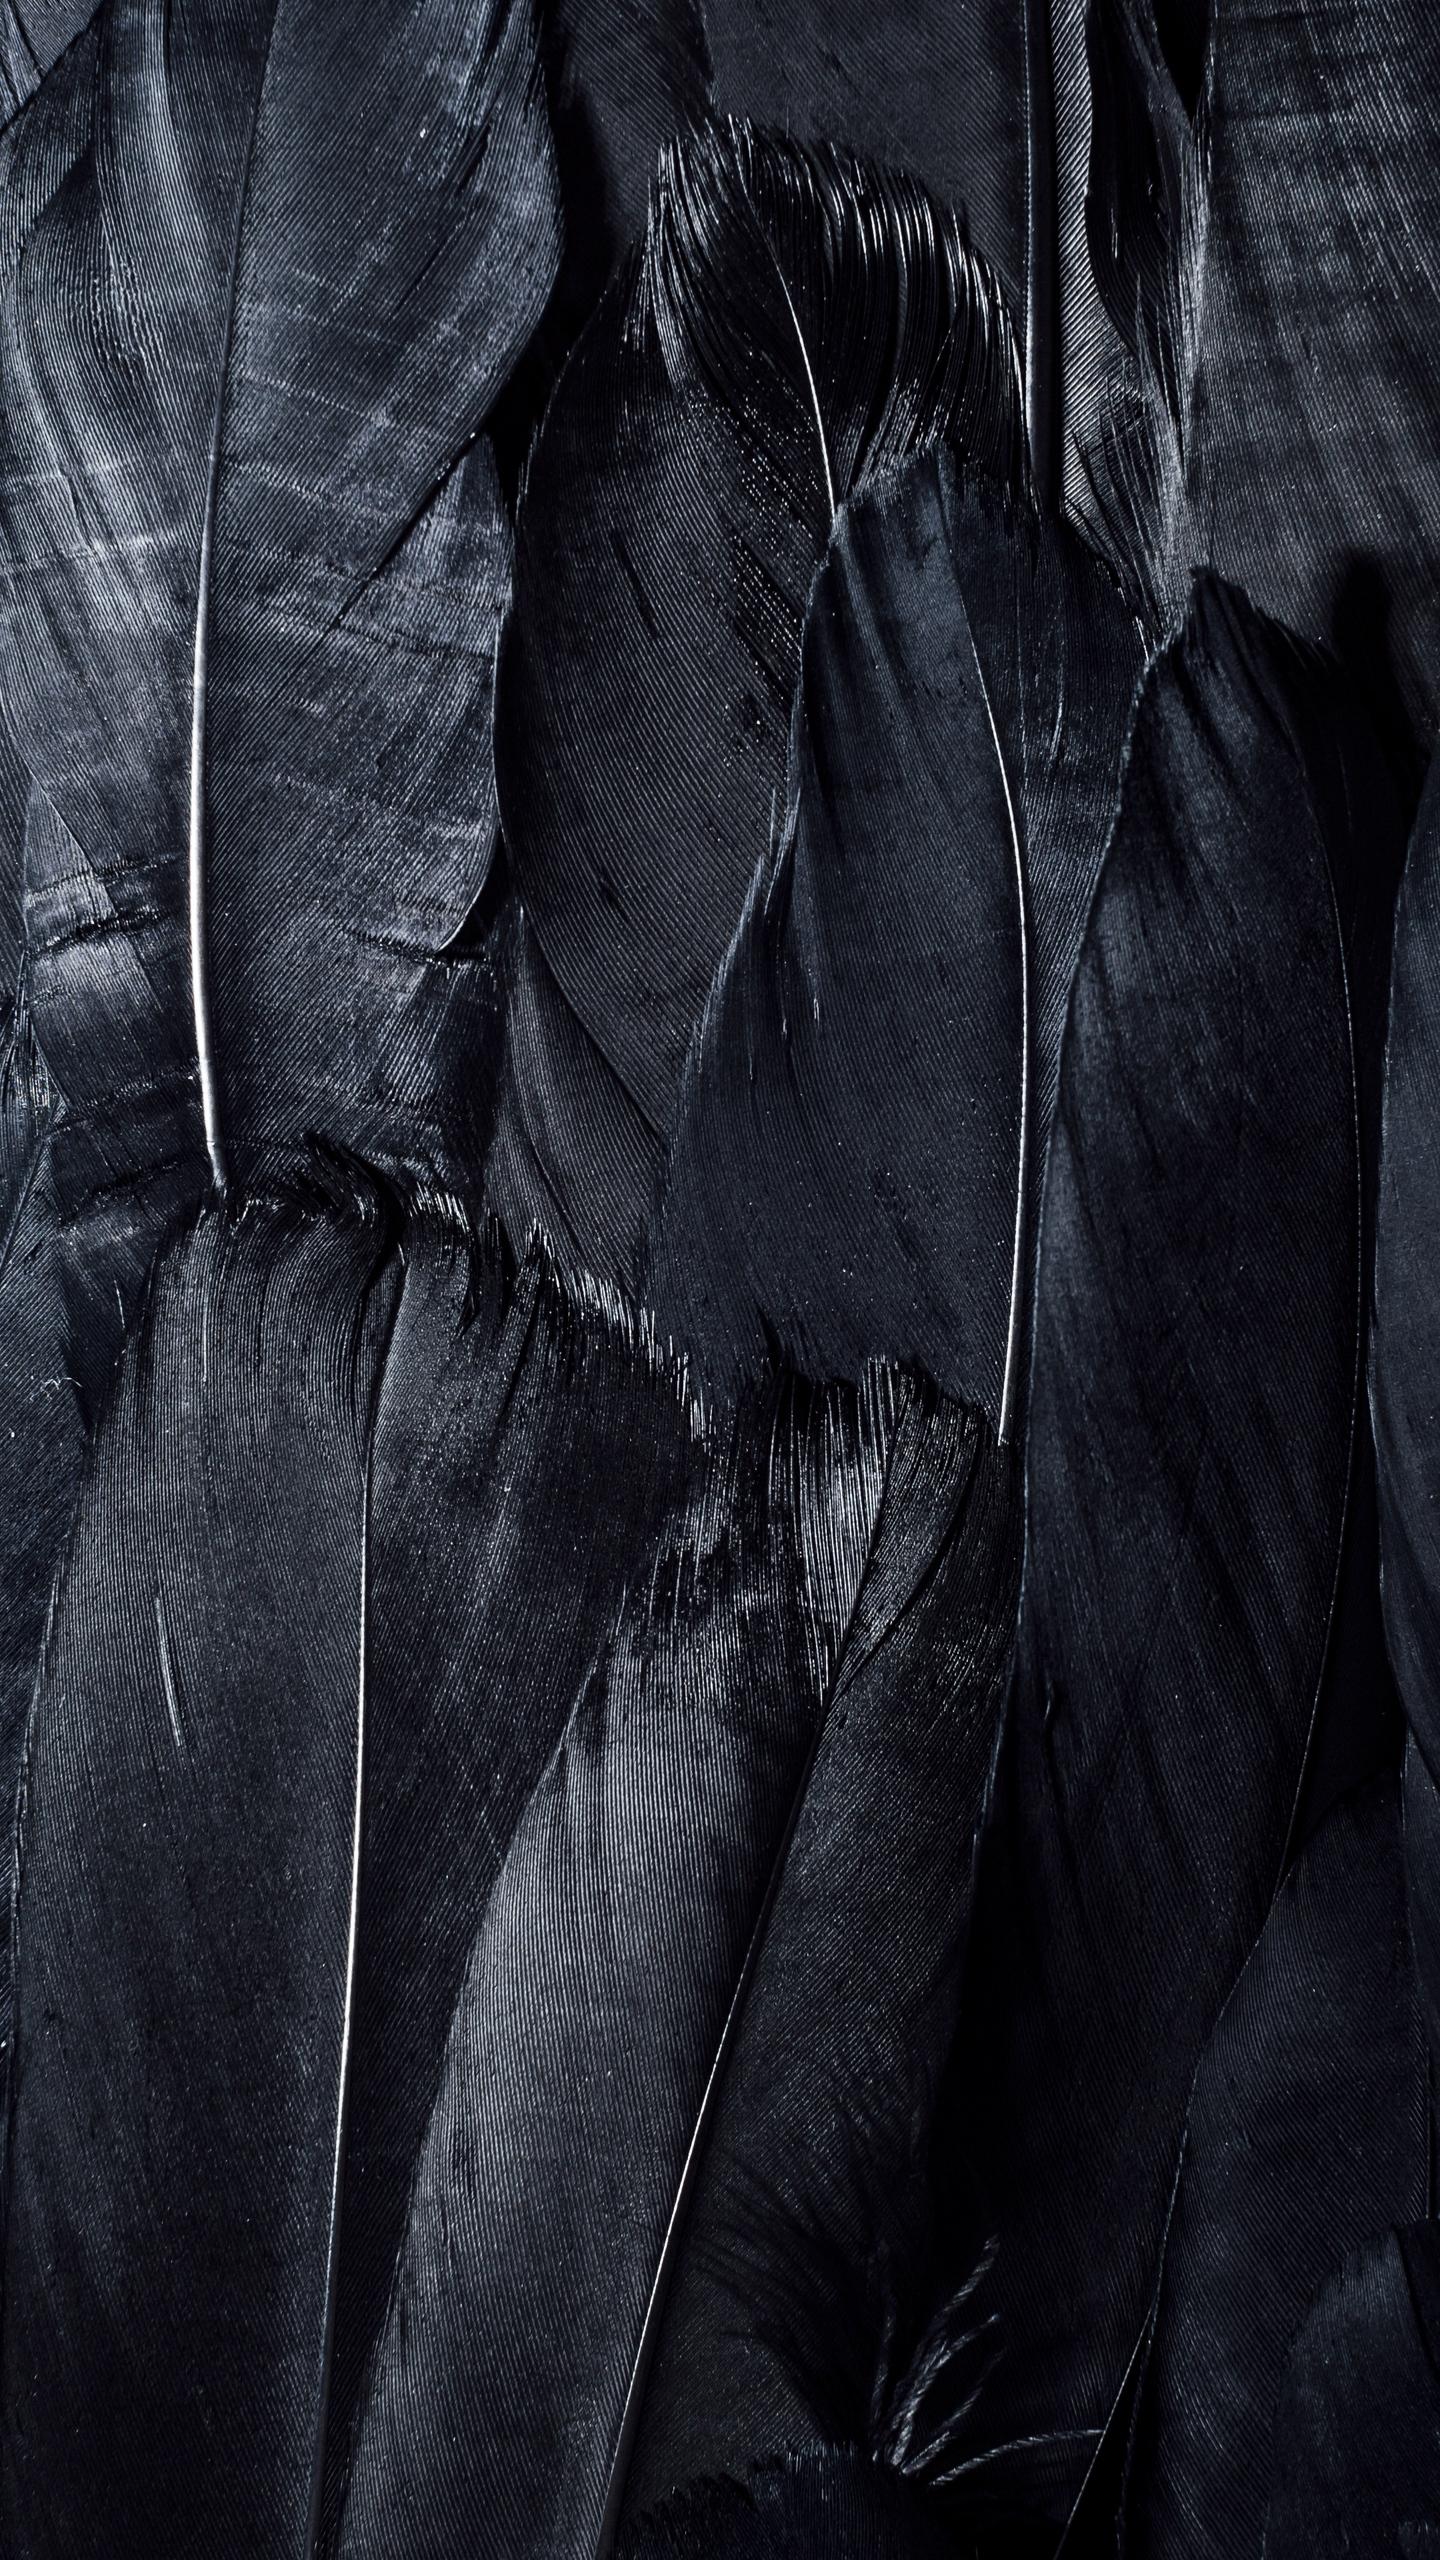 Wallpaper Feathers Black Dark Background Black Hd 1440x2560 Wallpaper Teahub Io